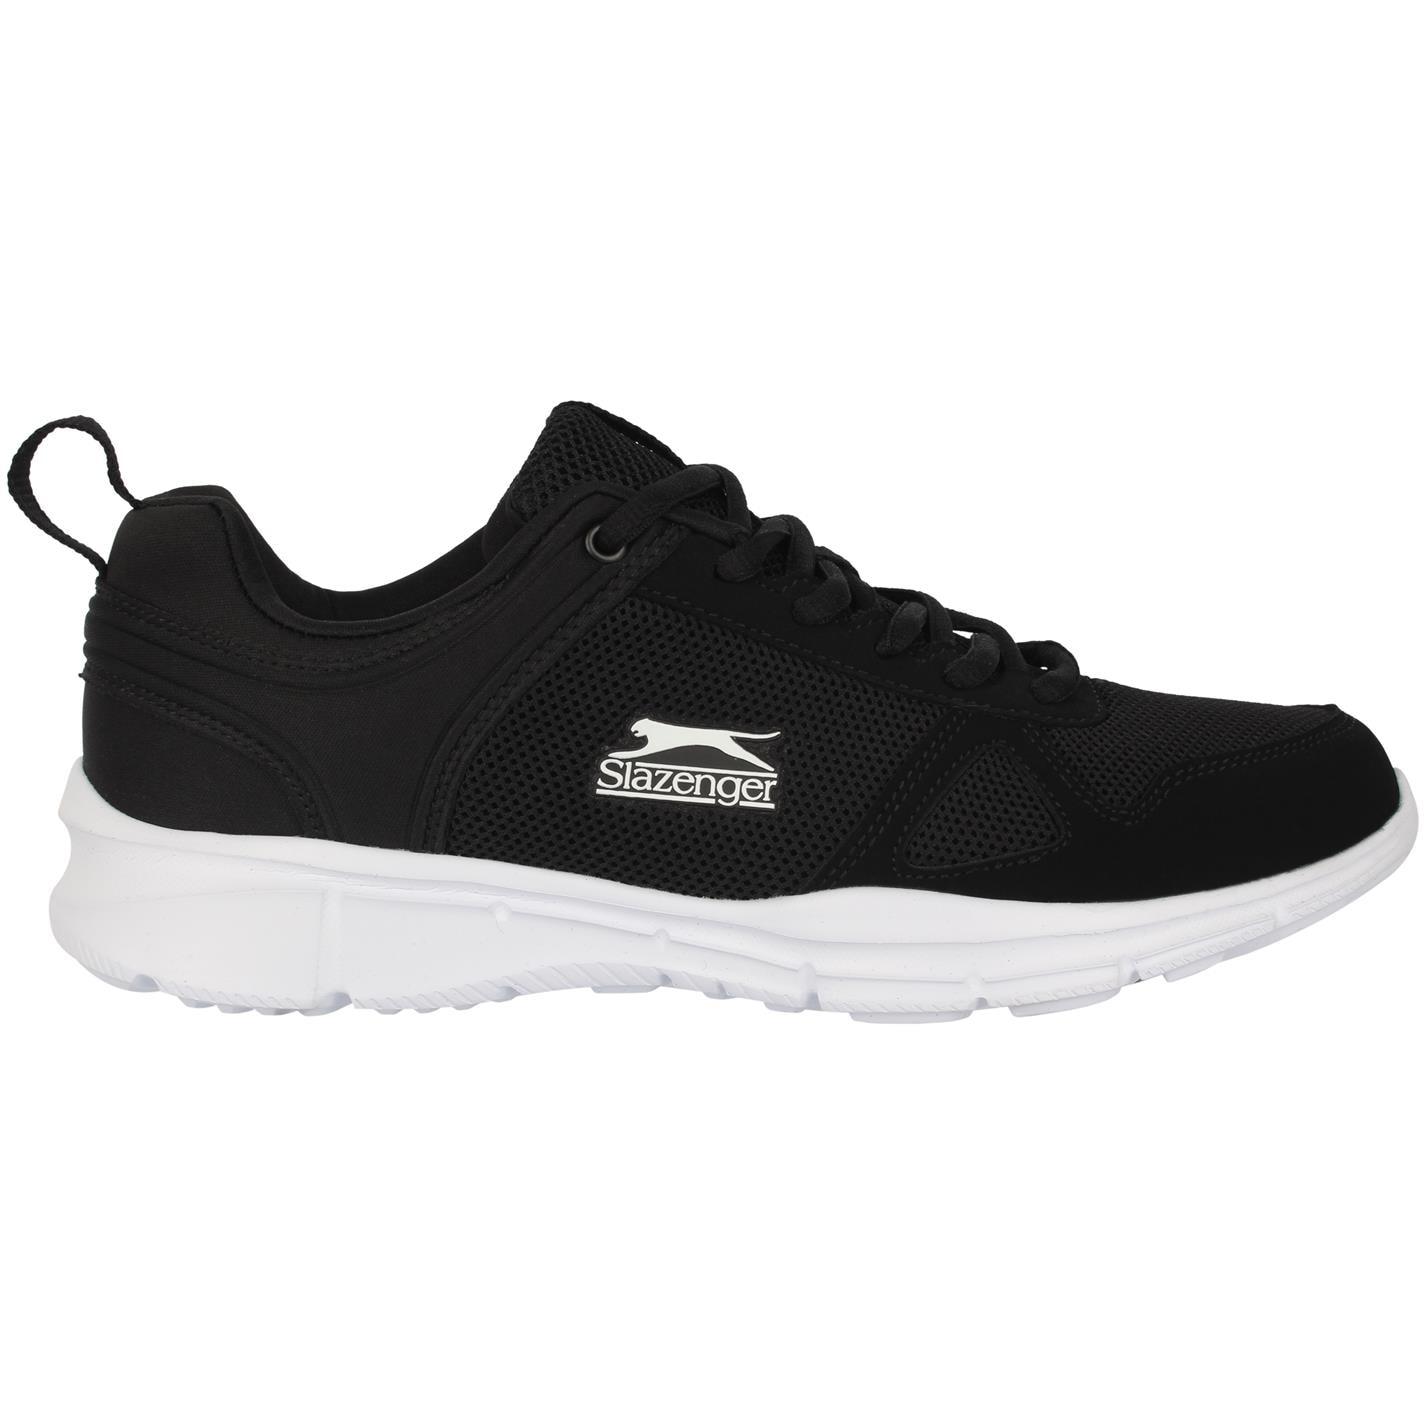 Adidasi alergare Slazenger Force plasa pentru Barbati negru alb